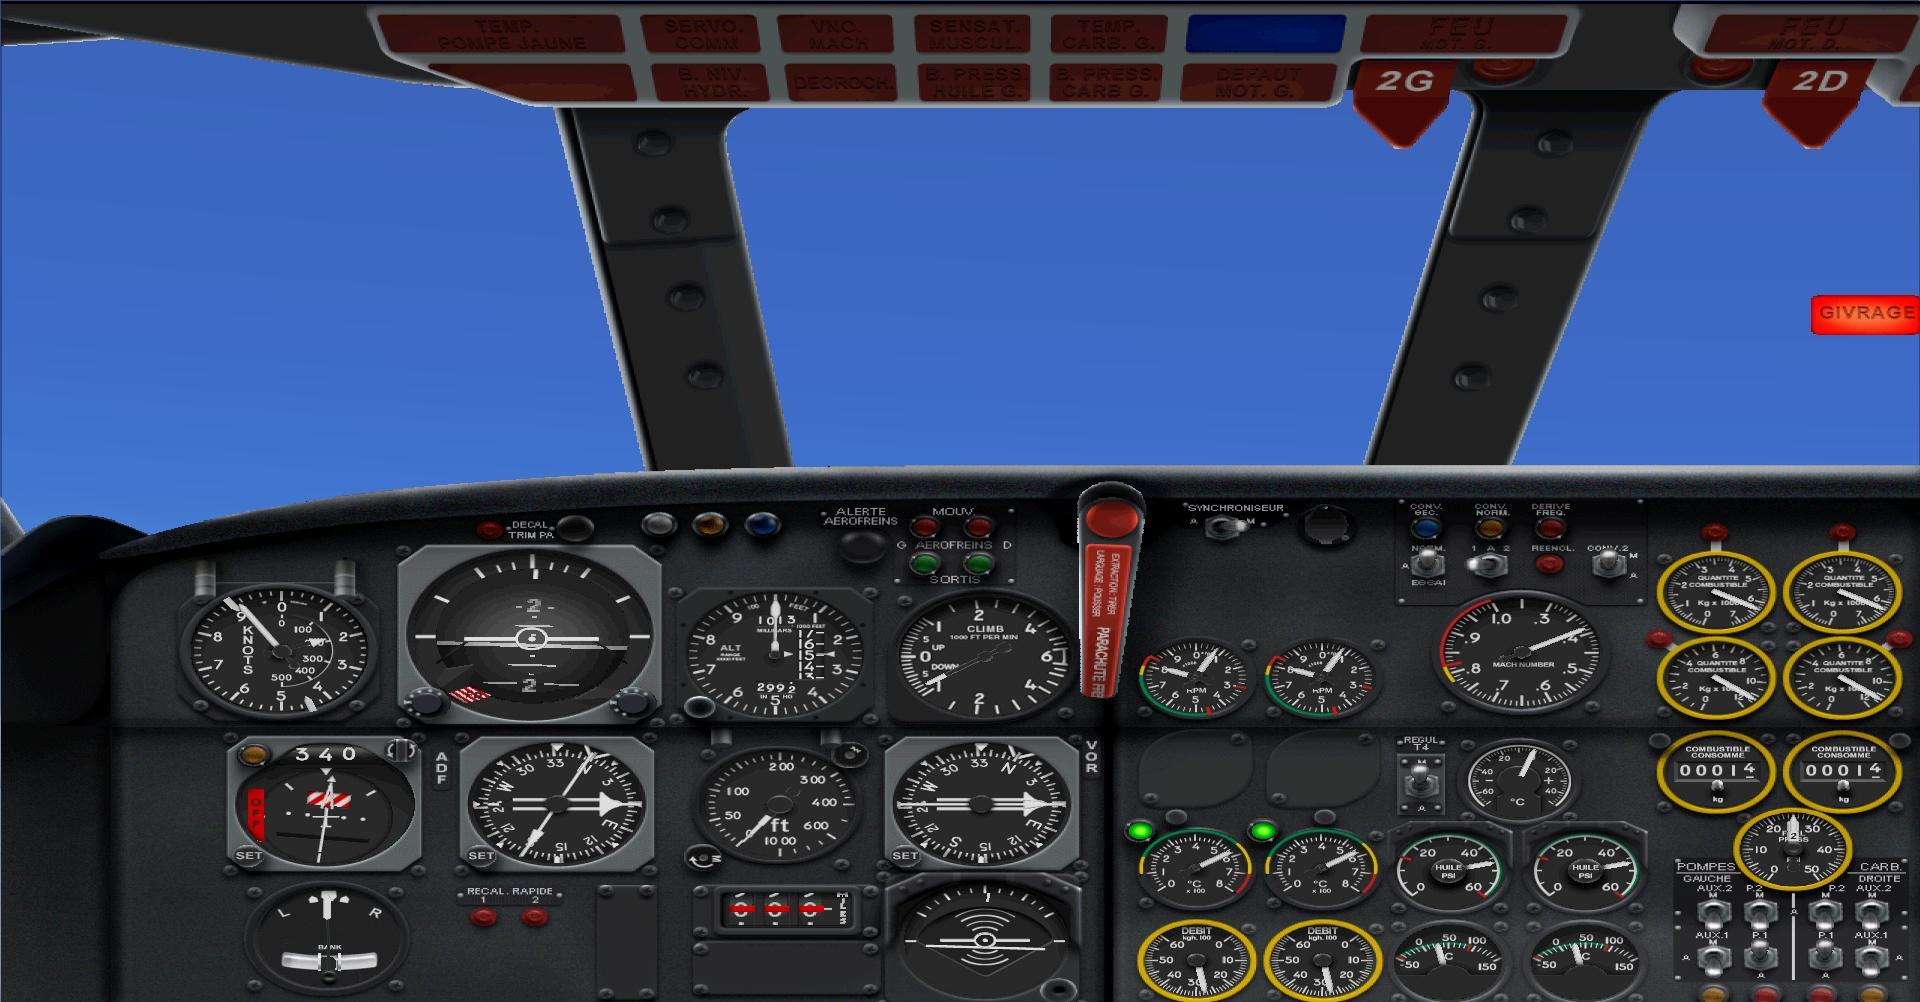 DOWNLOAD AFG Caravelle III SE-210 FSX & FSX-Steam - Rikoooo